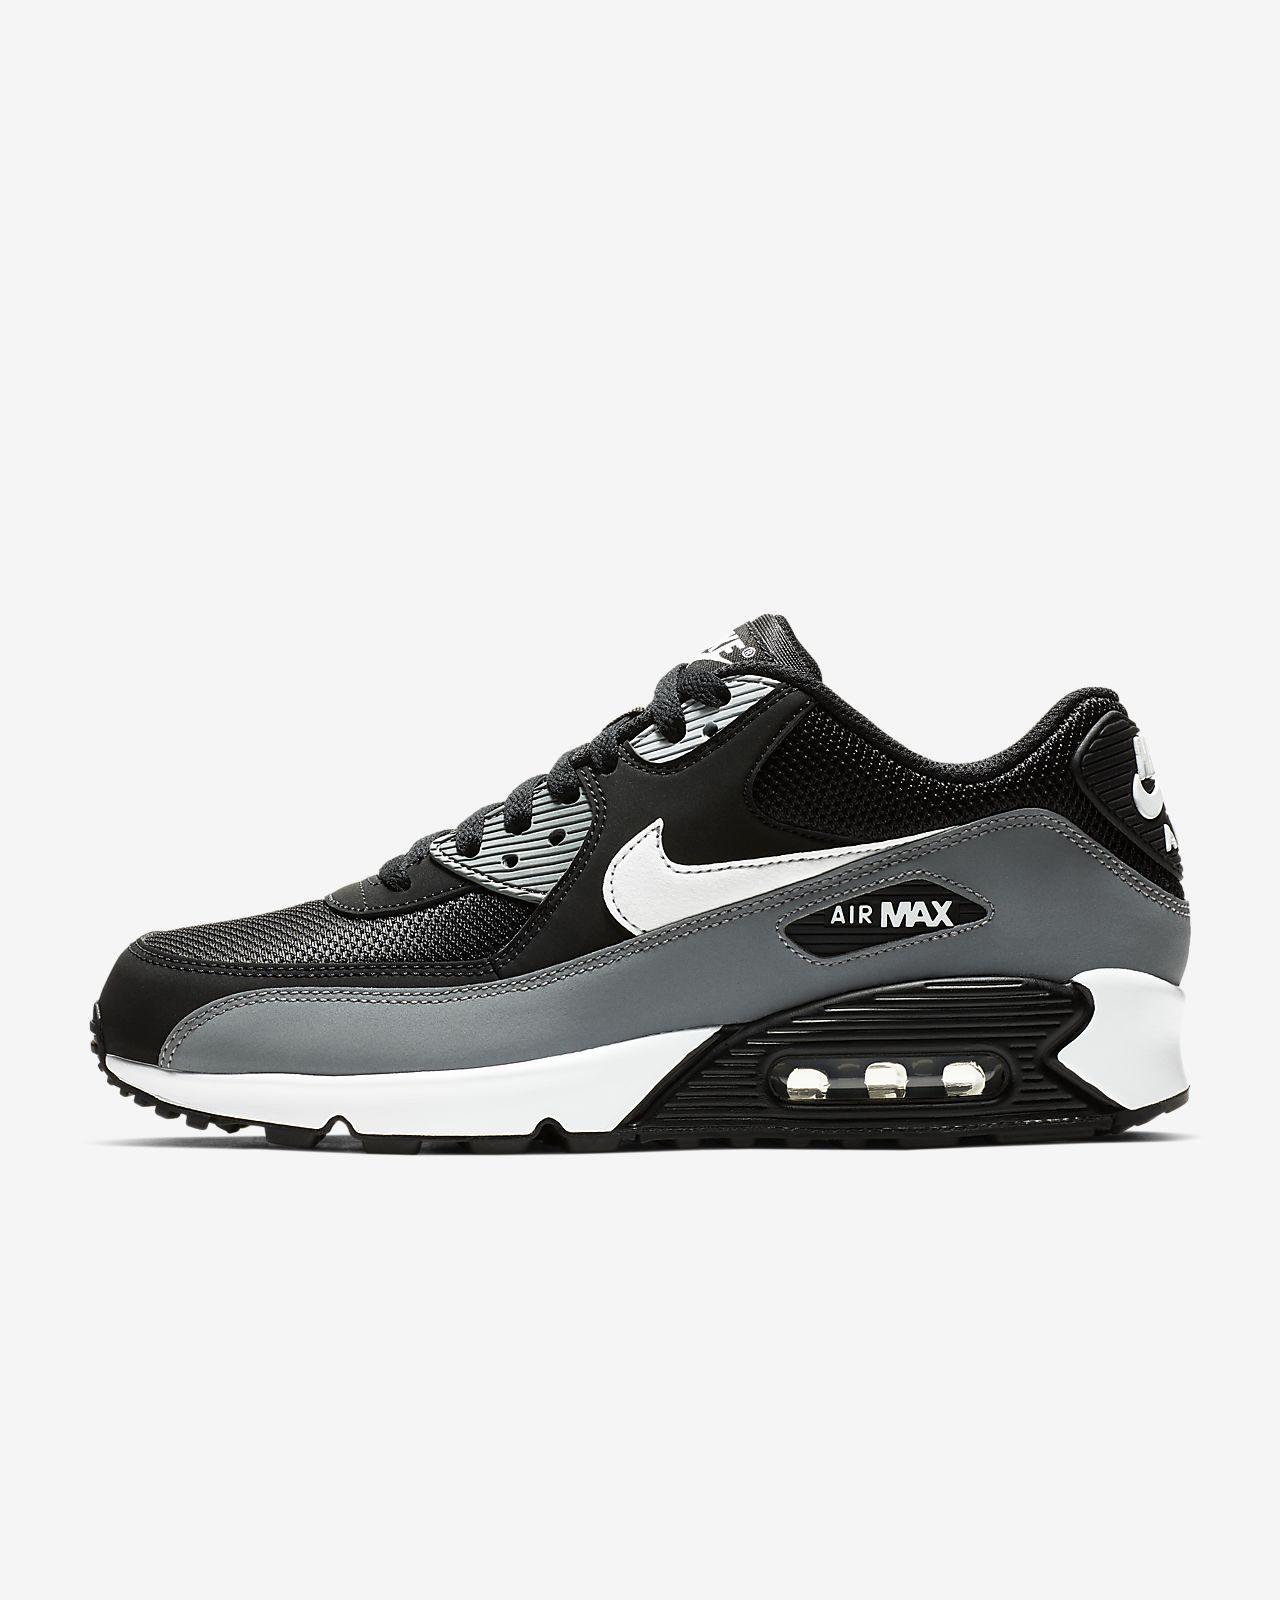 Essential Chaussure Pour Nike 90 Max Air Homme vwO0q6